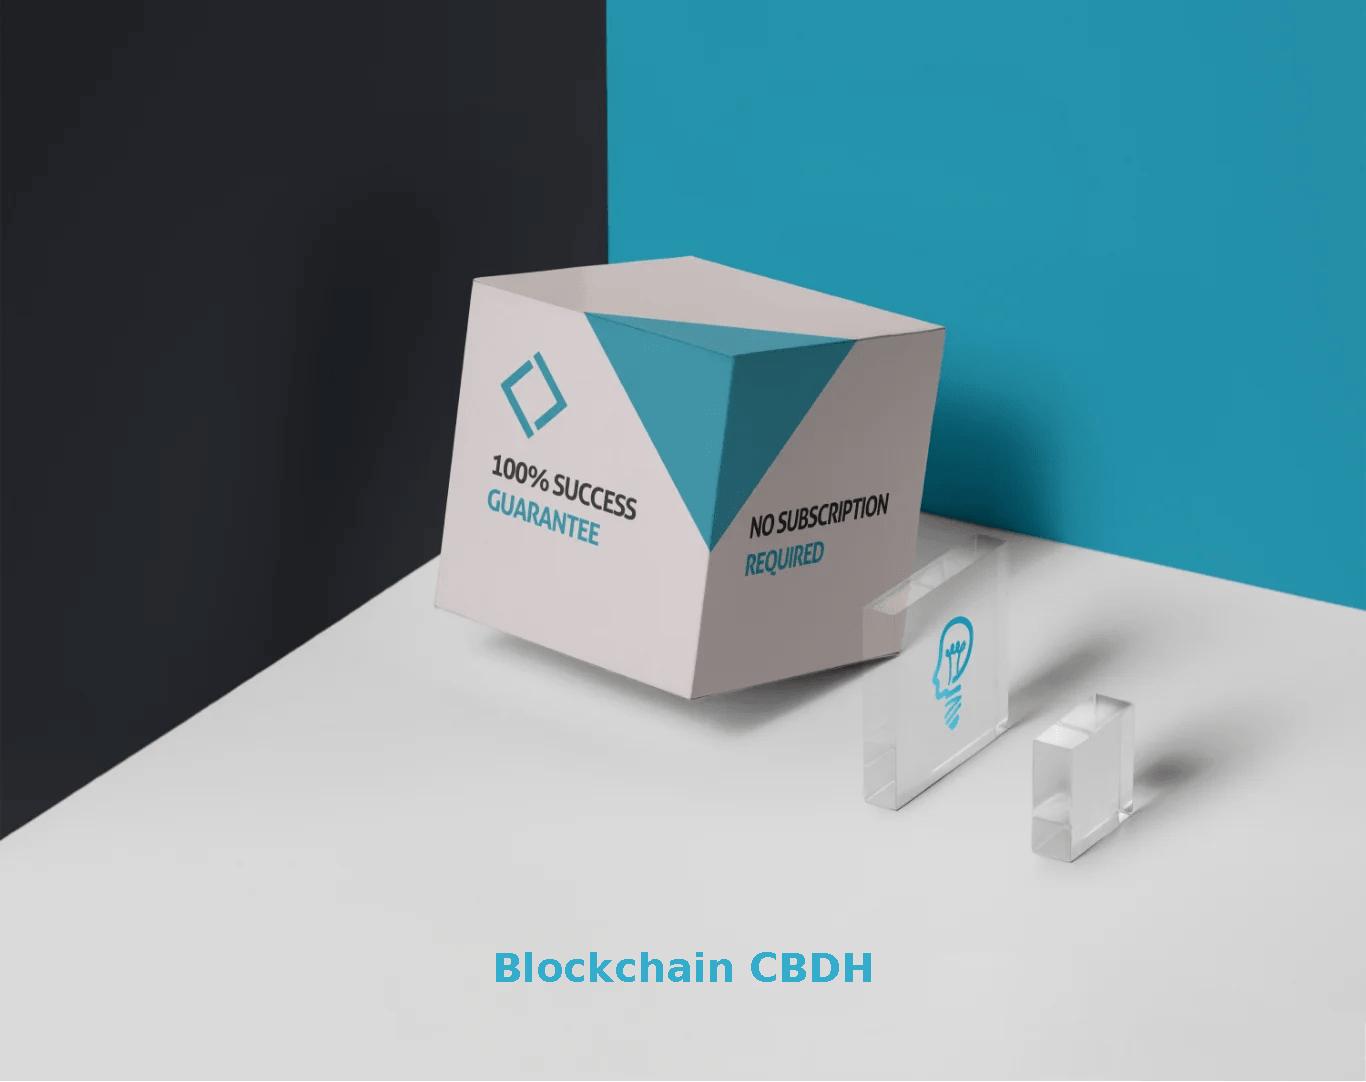 Blockchain CBDH Exams